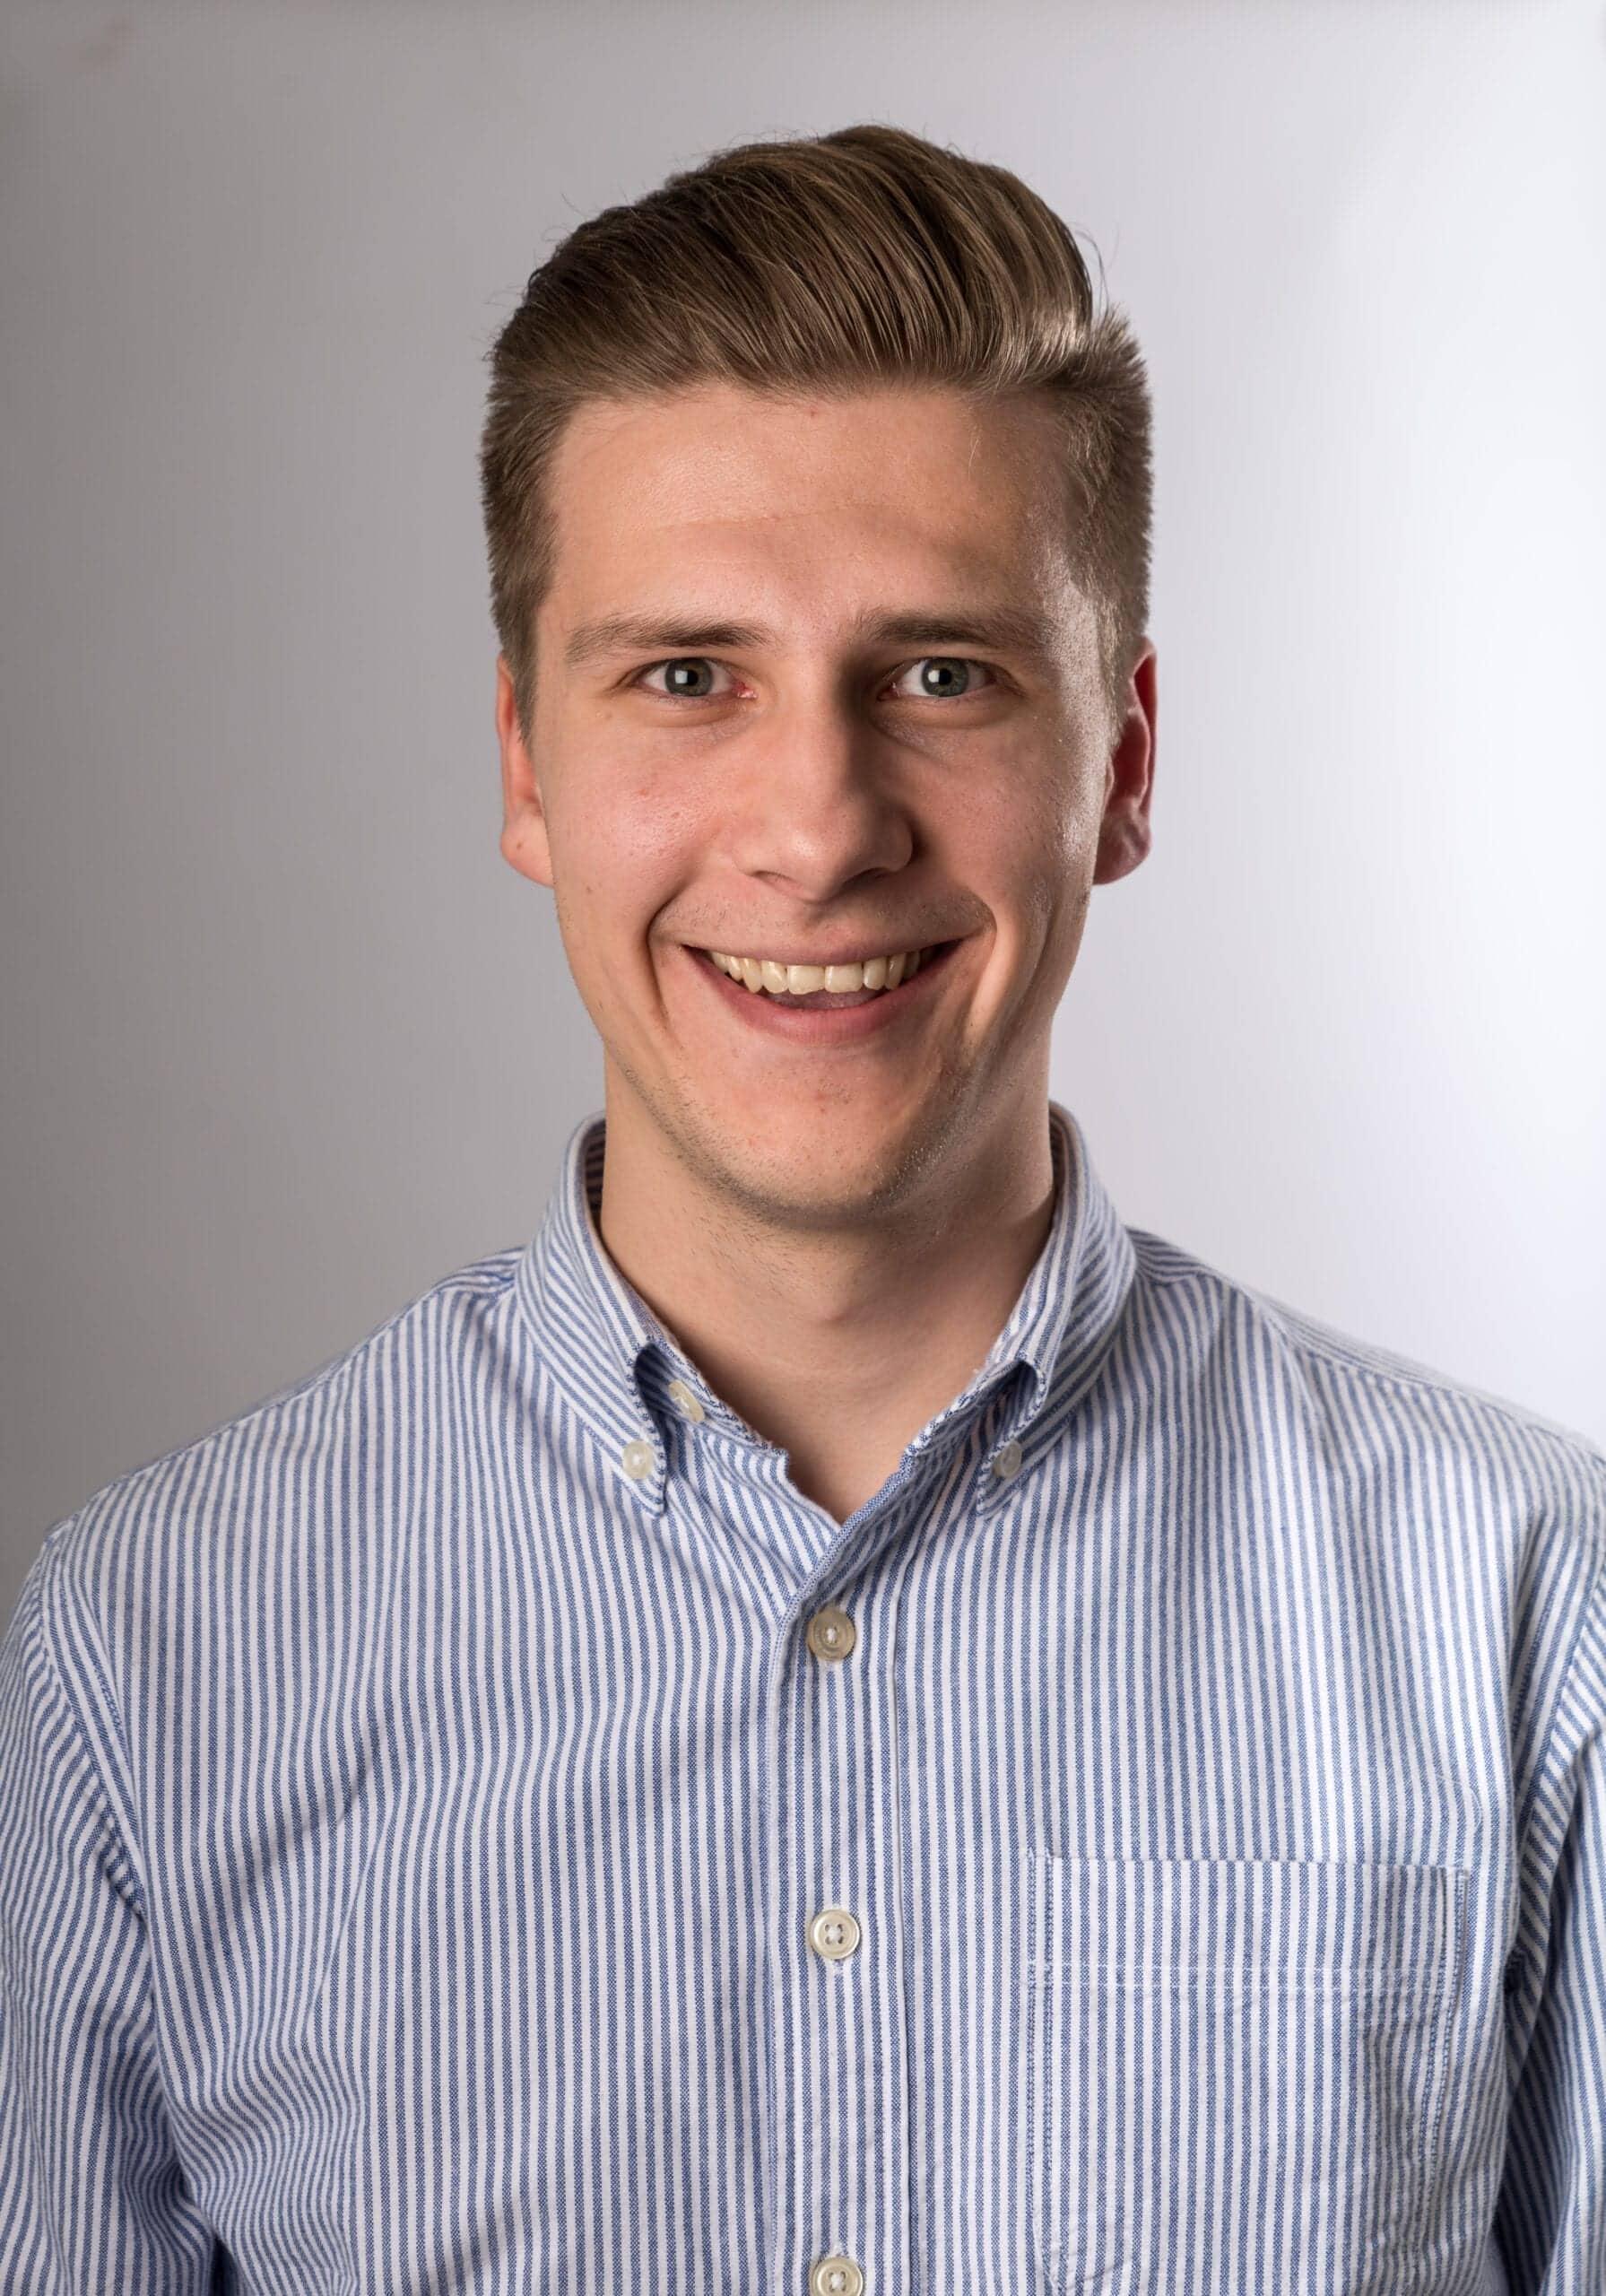 Niklas Ruottu